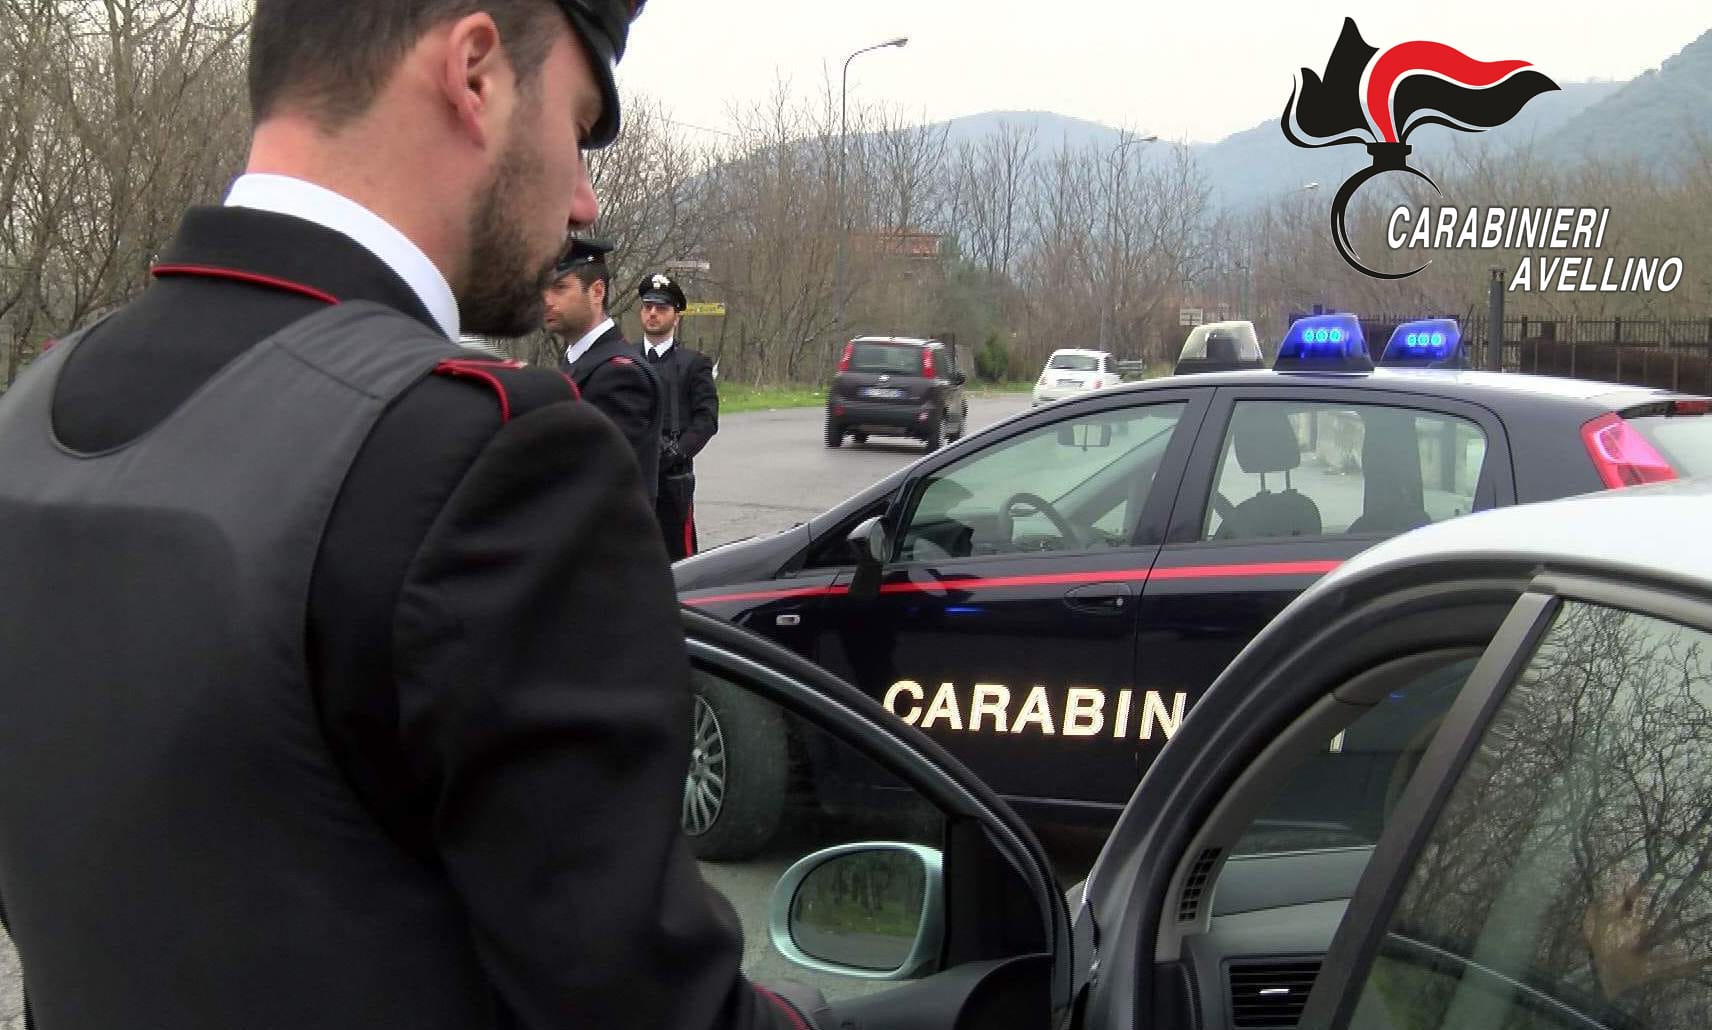 carabinieri-avellino